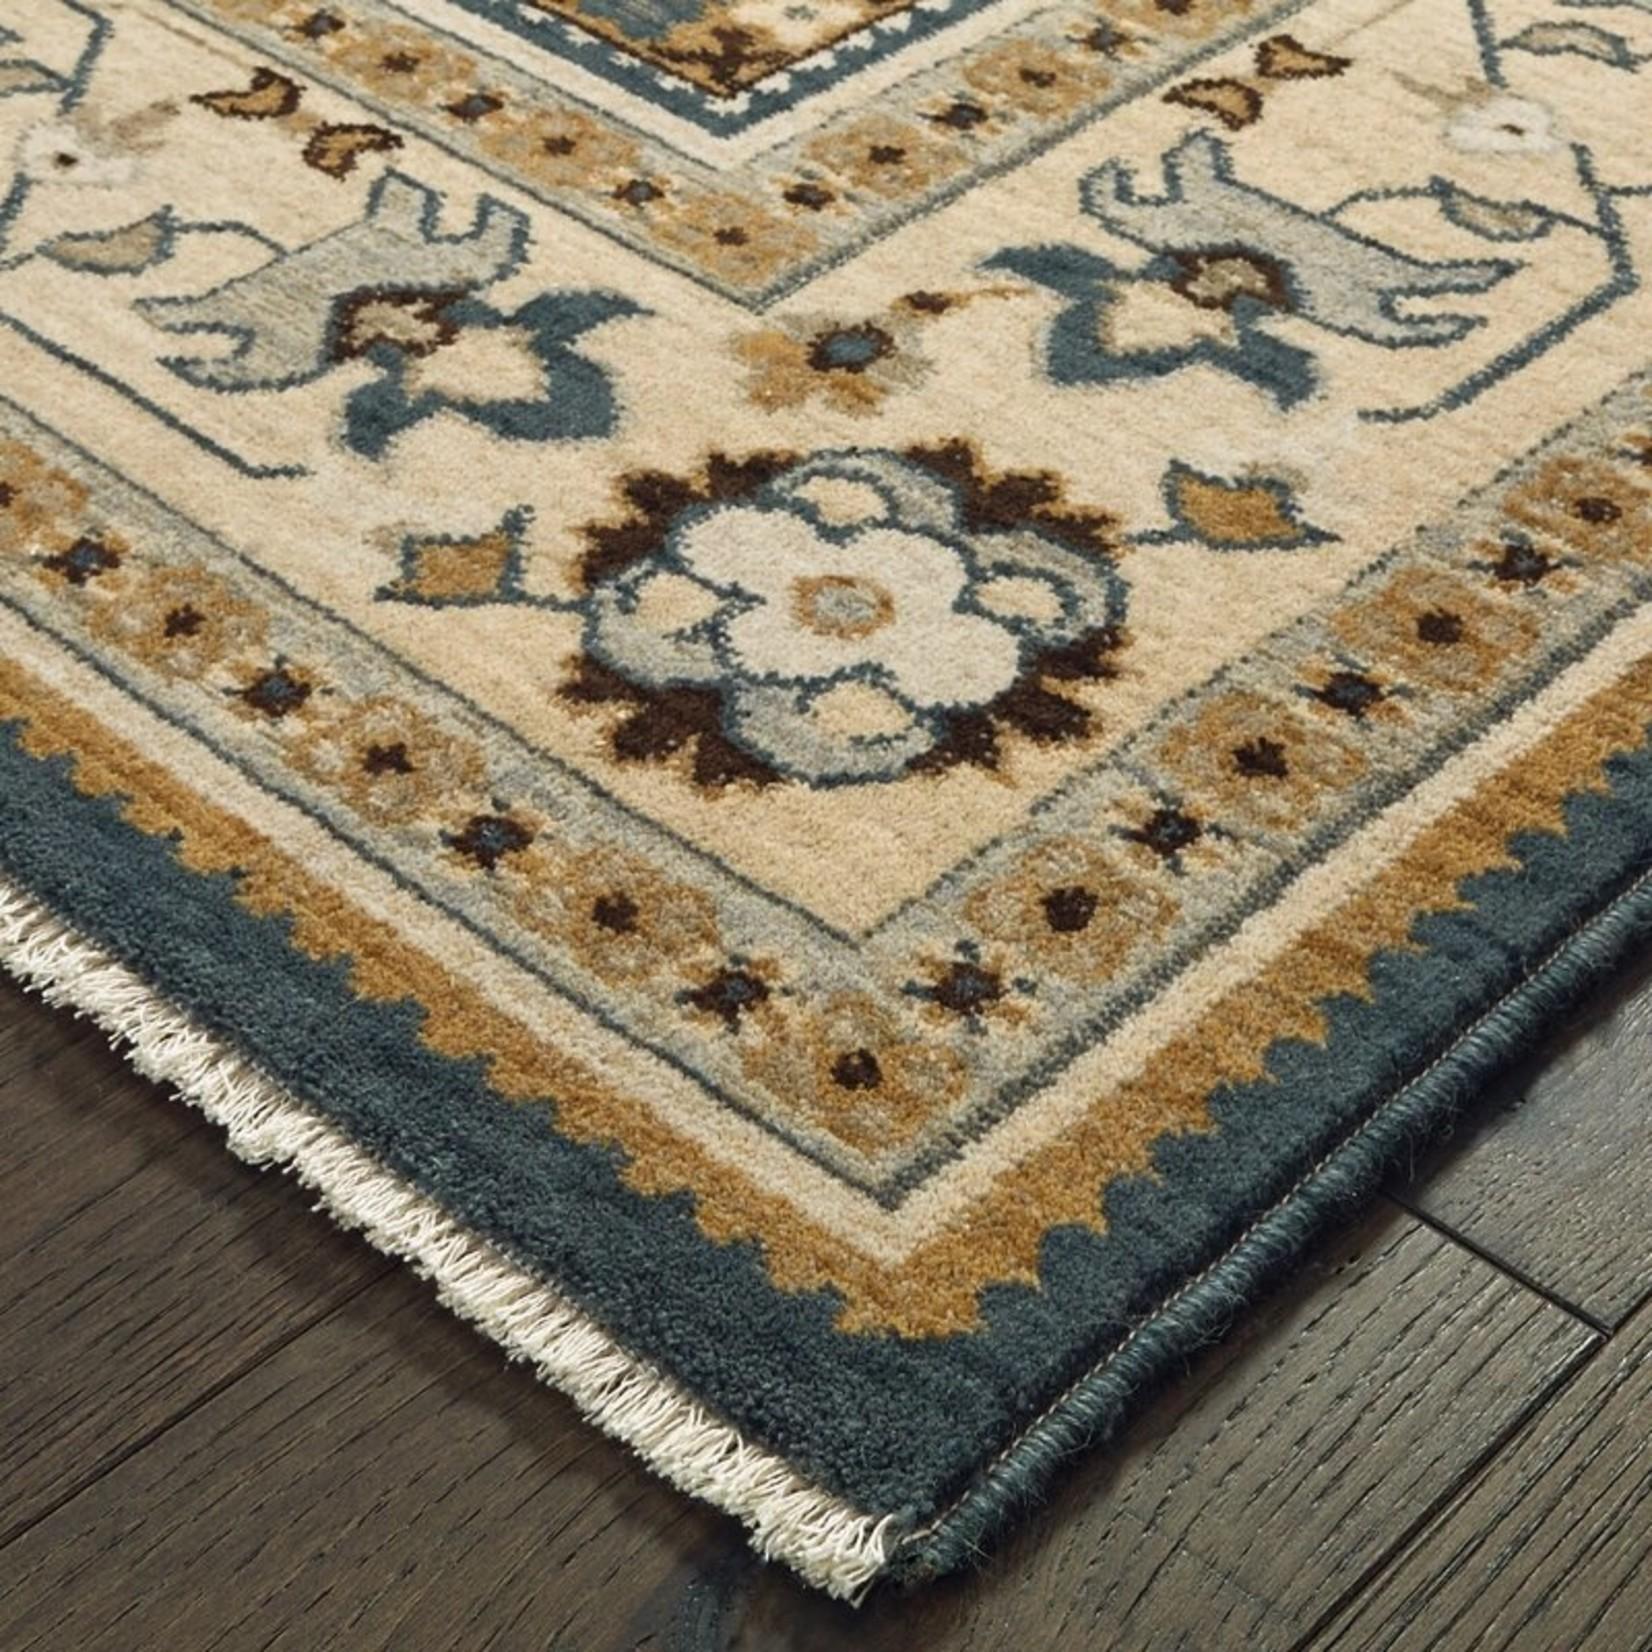 *2' x 3' -  Ashville Oriental Teal Blue Area Rug